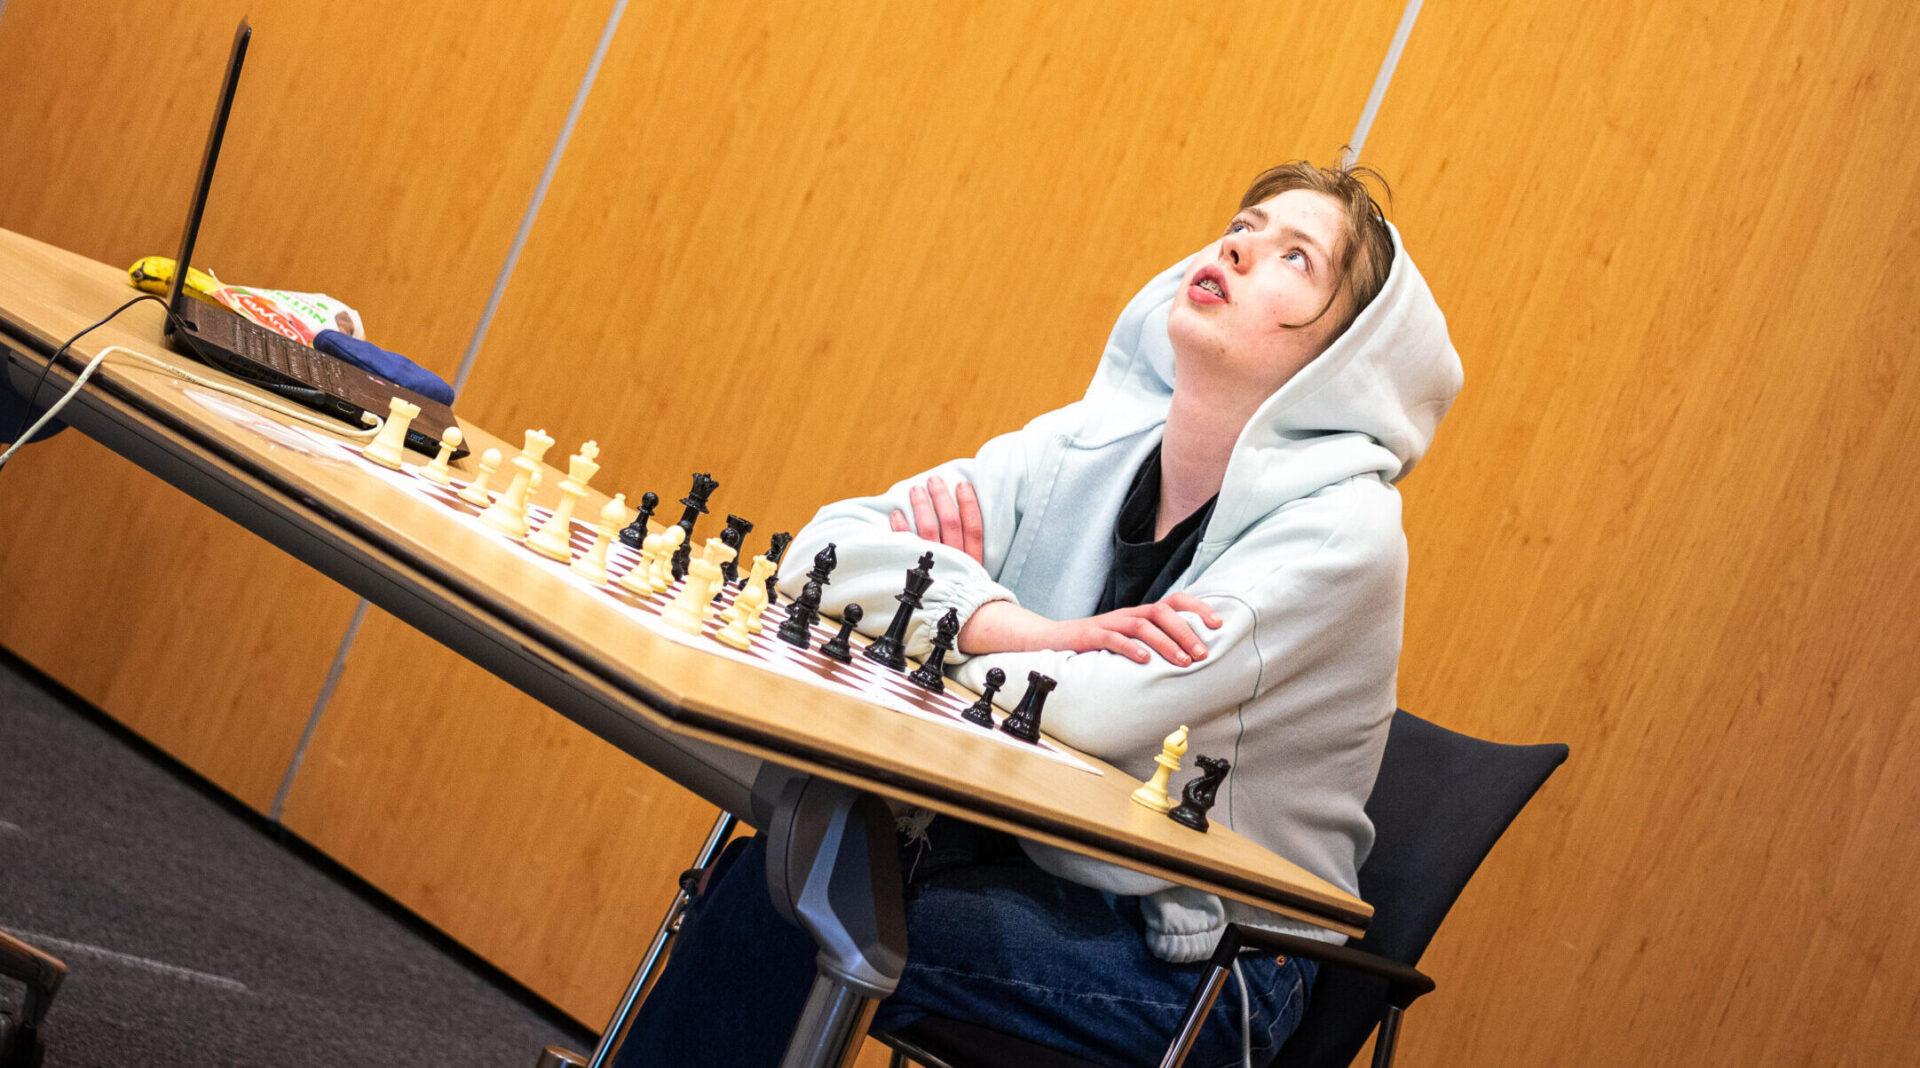 Eline Roebers in voller Konzentration im Sportzentrum Papendal! | Foto: Lennart Ootes